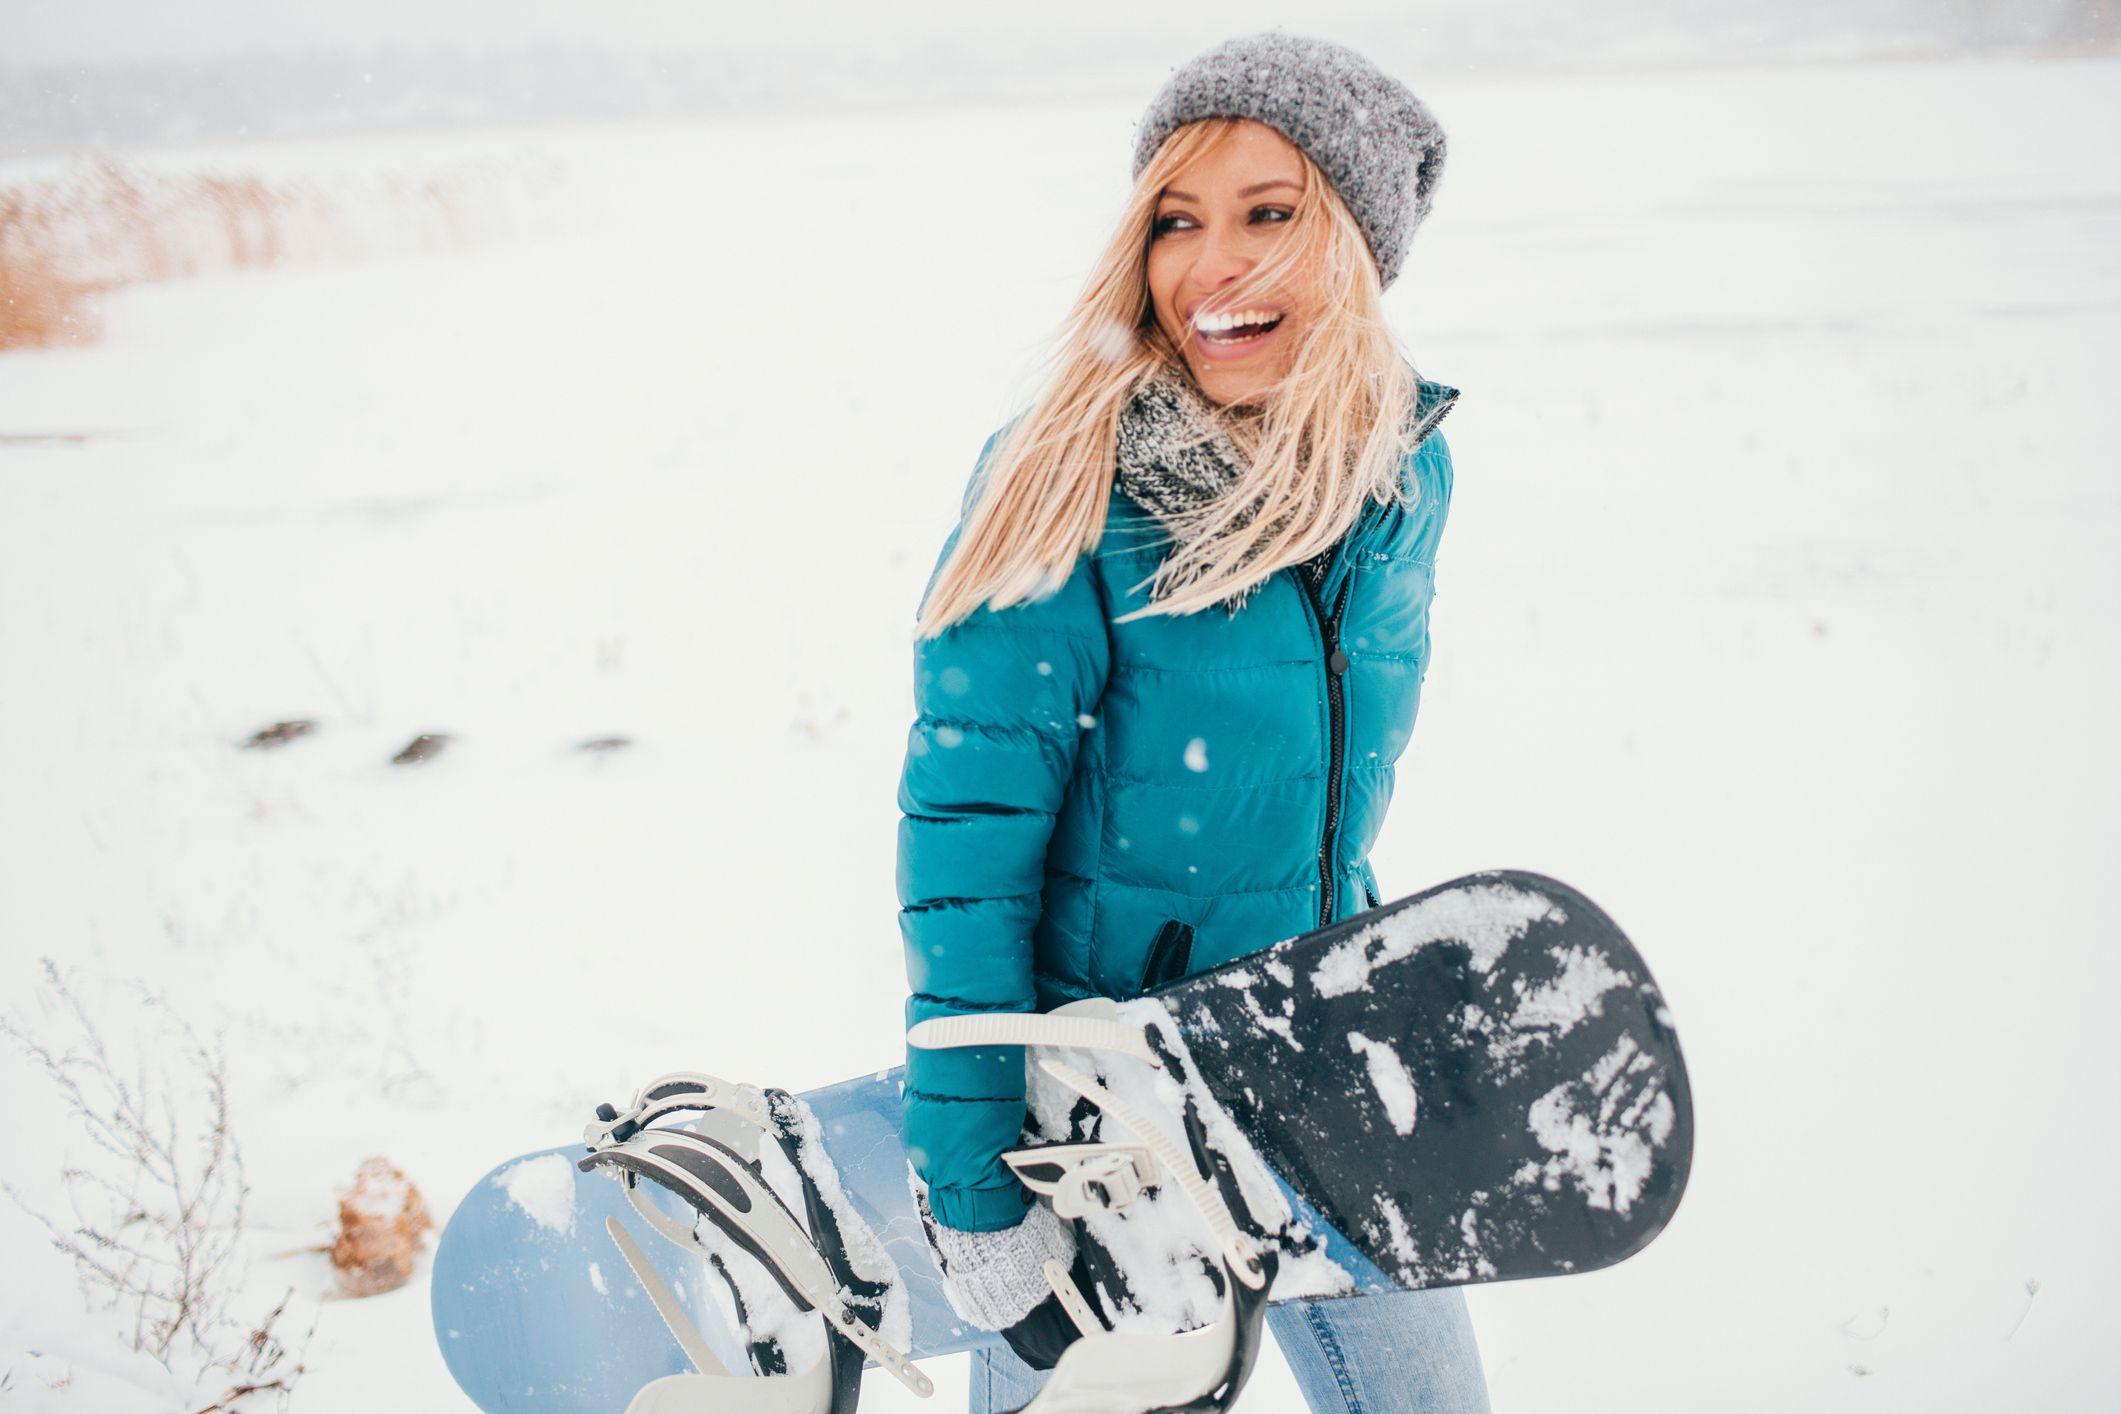 The 10 Best Snowboard Jackets